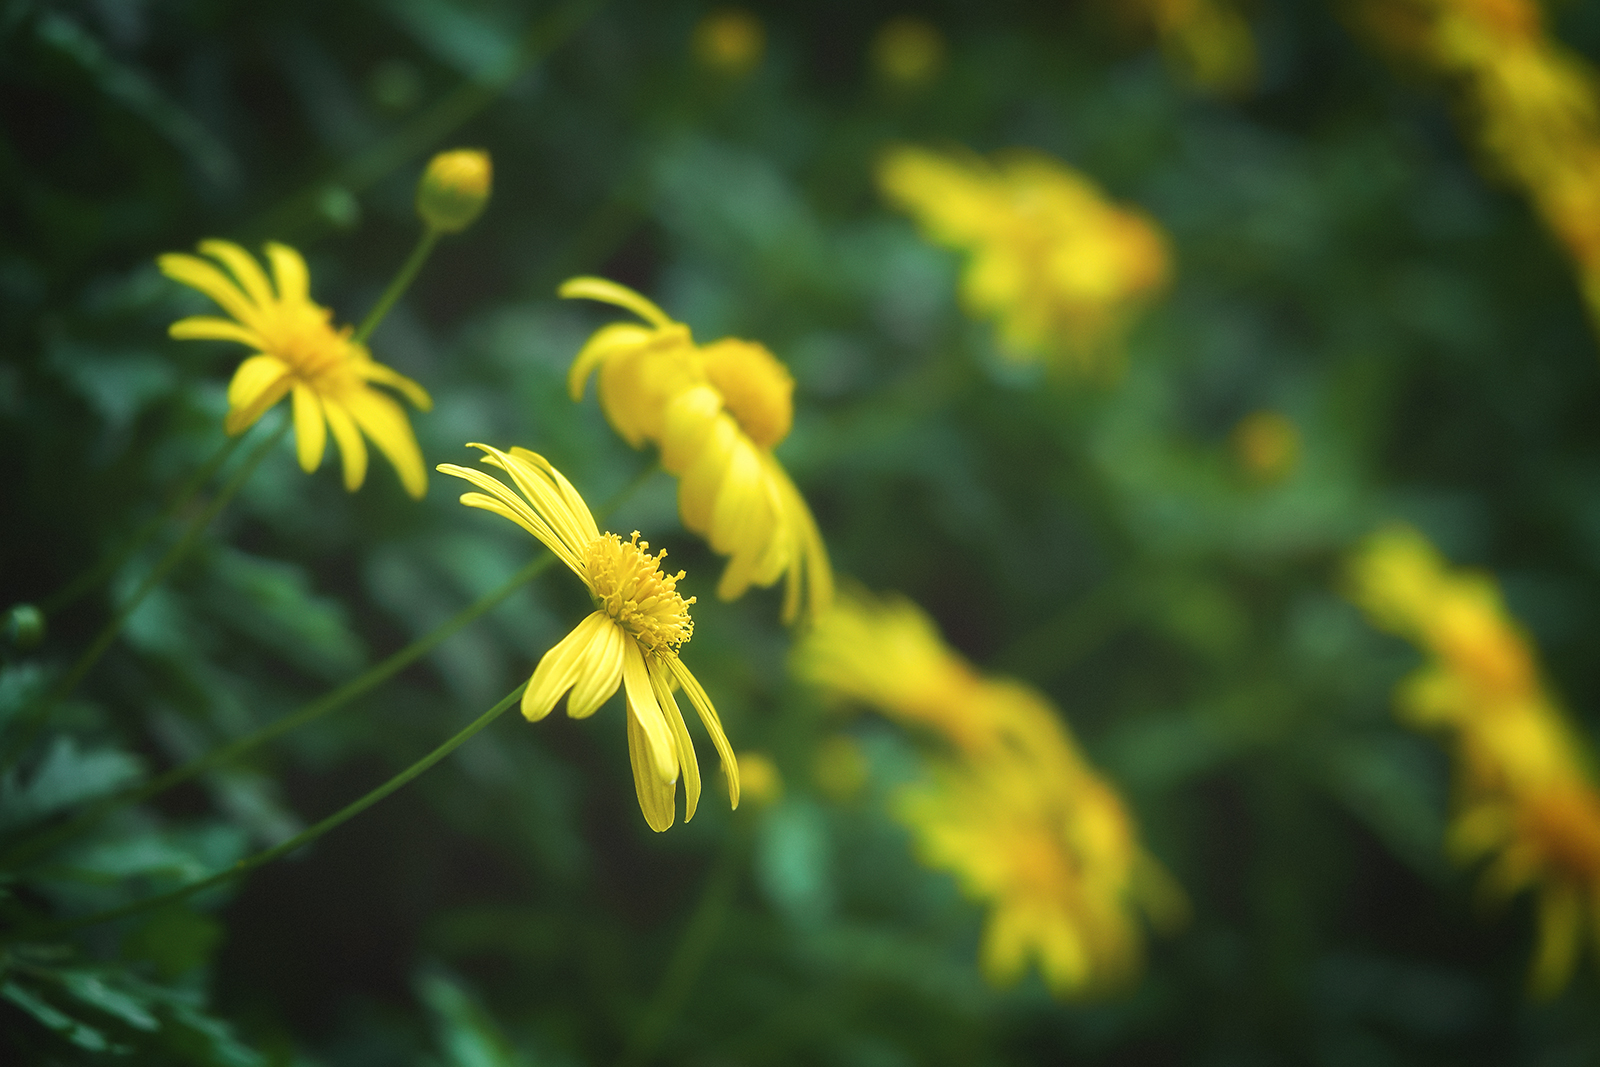 Yellow Daisies Blooming